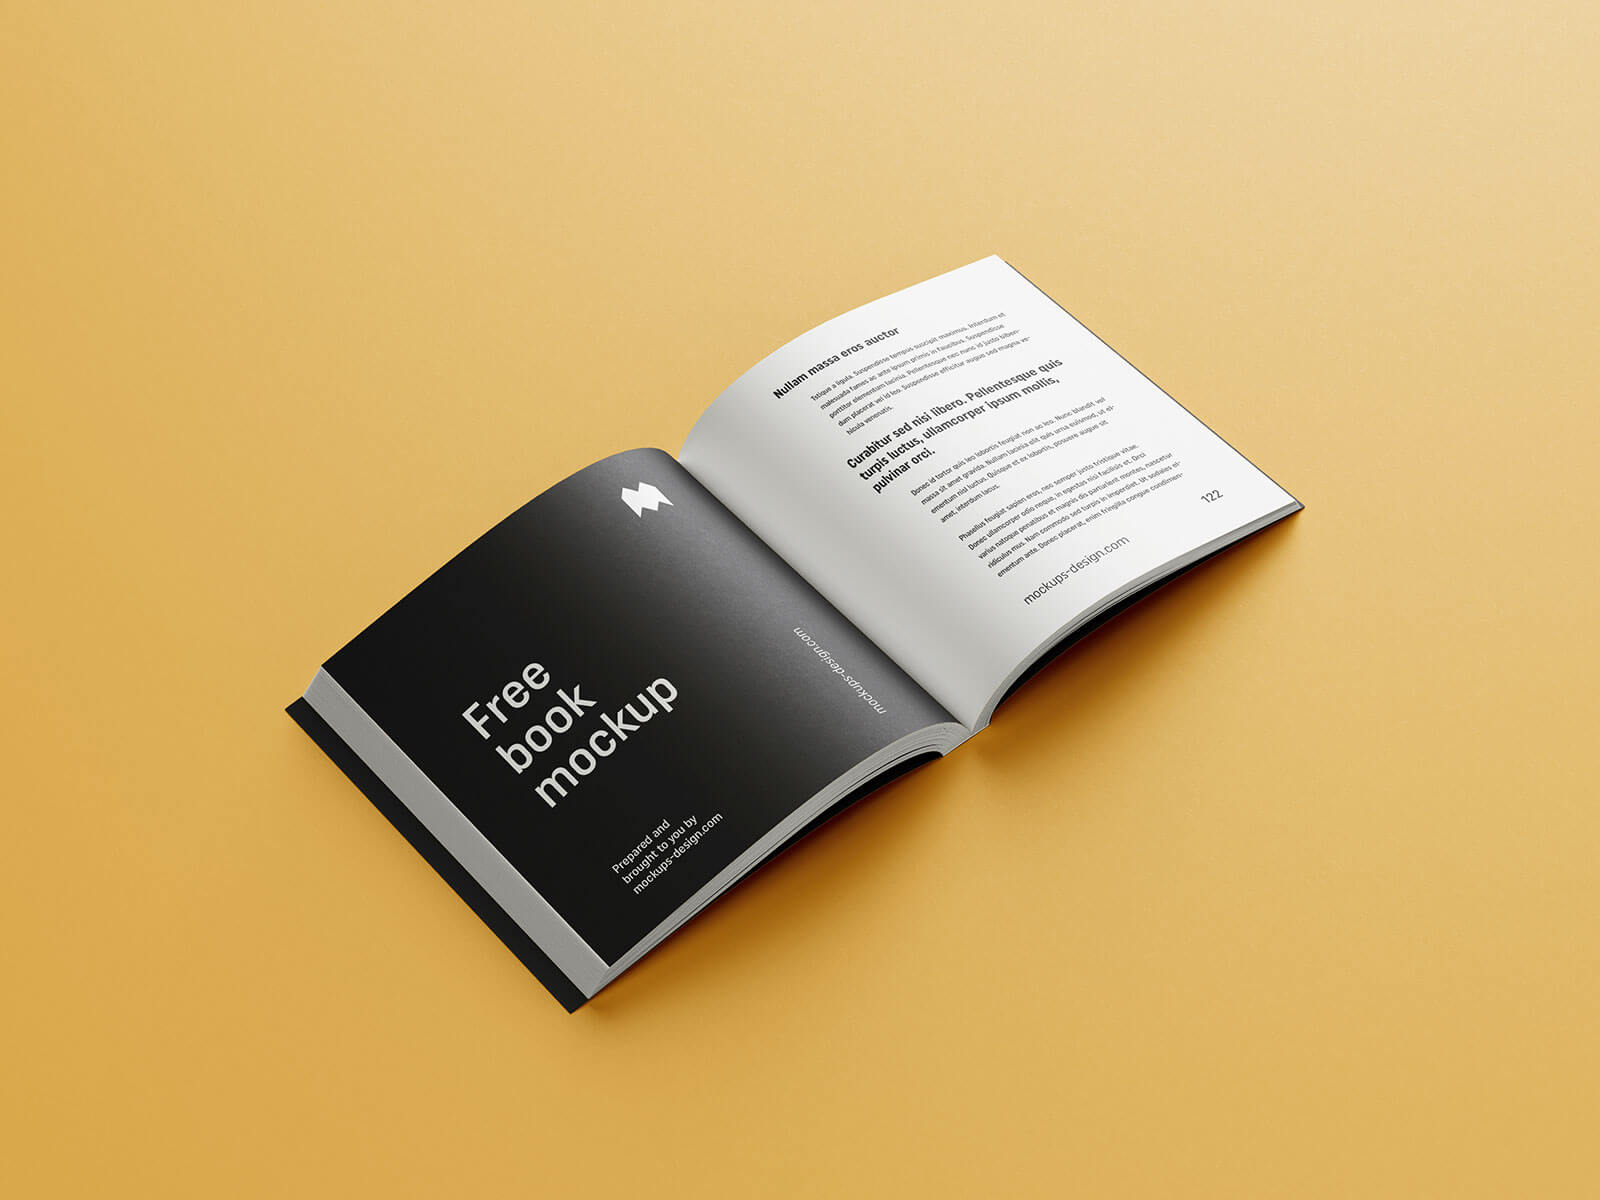 Free Square Paperback Book Mockup PSD Set (1)